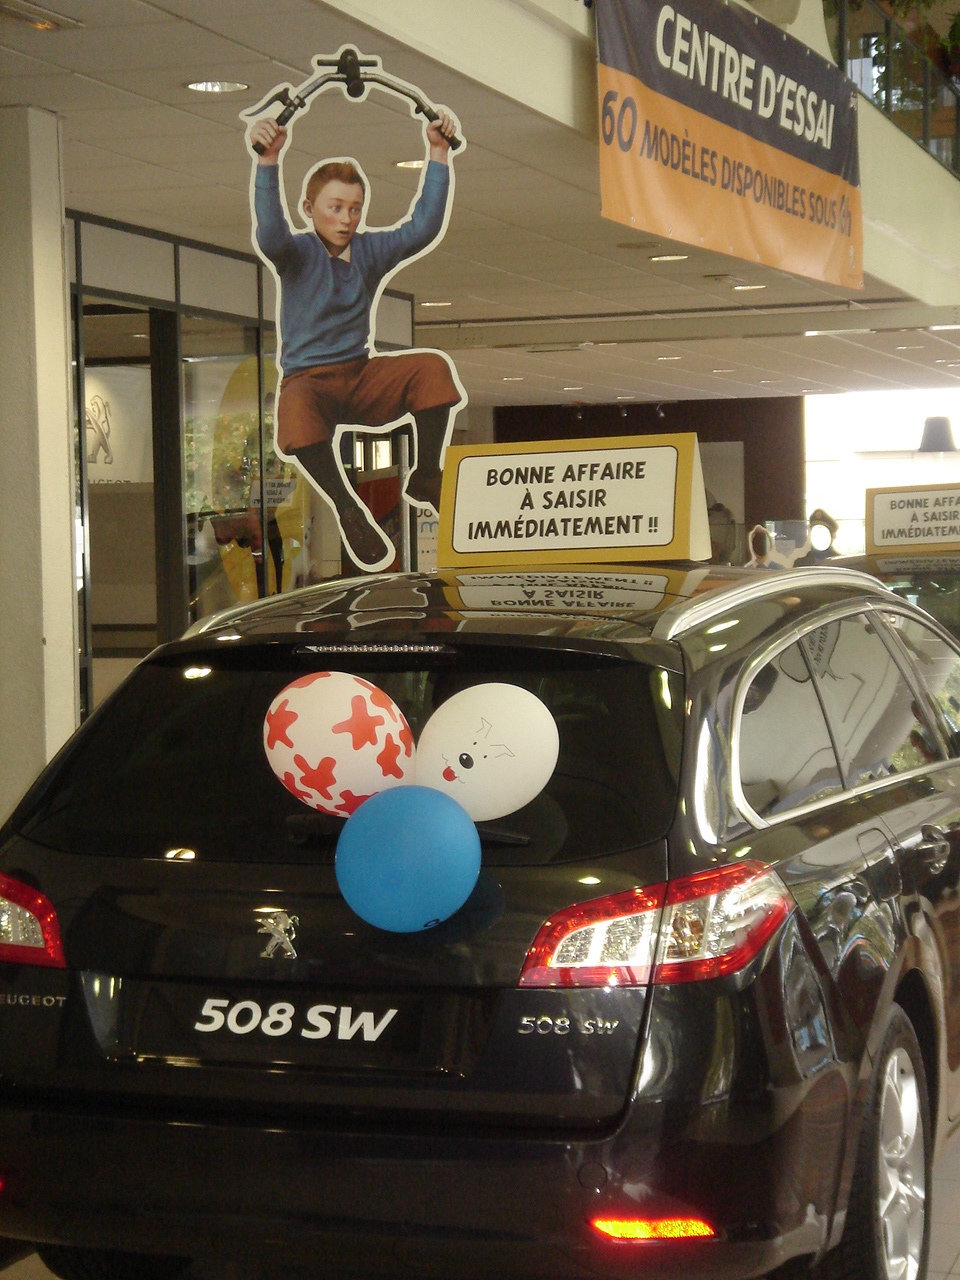 Peugeot Event Tintin 7